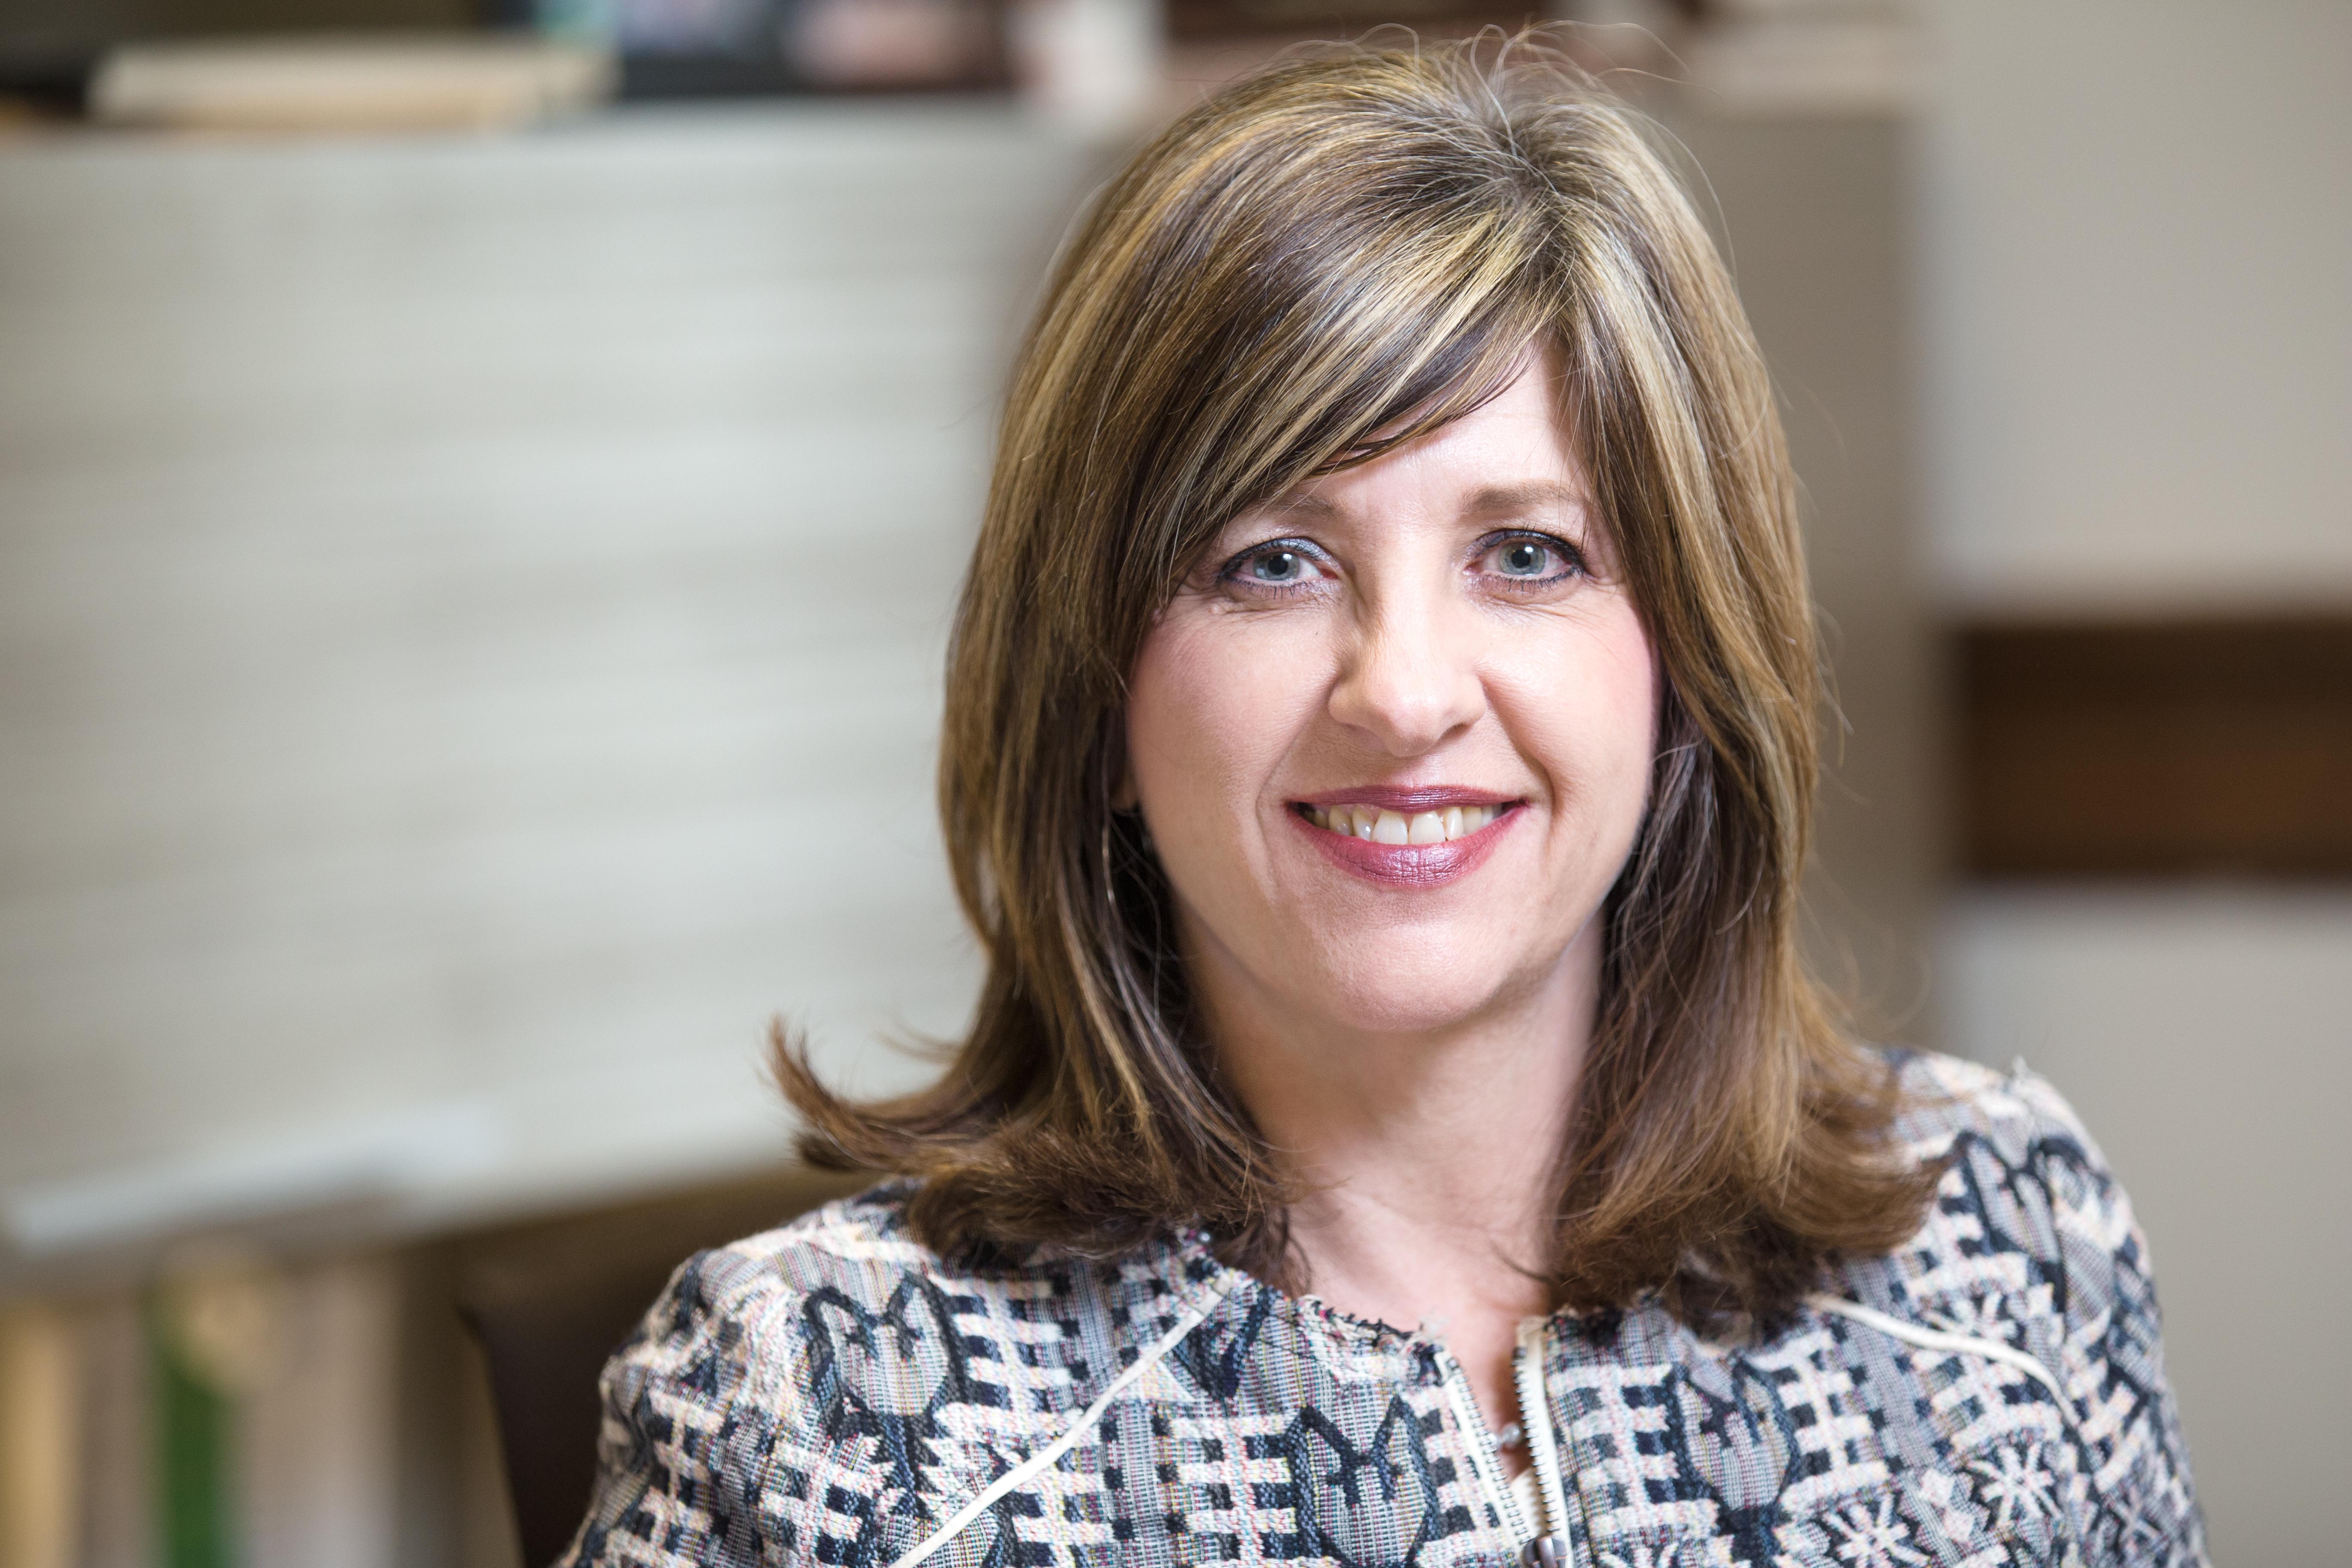 Director of Continuing Studies Brenda Sipe